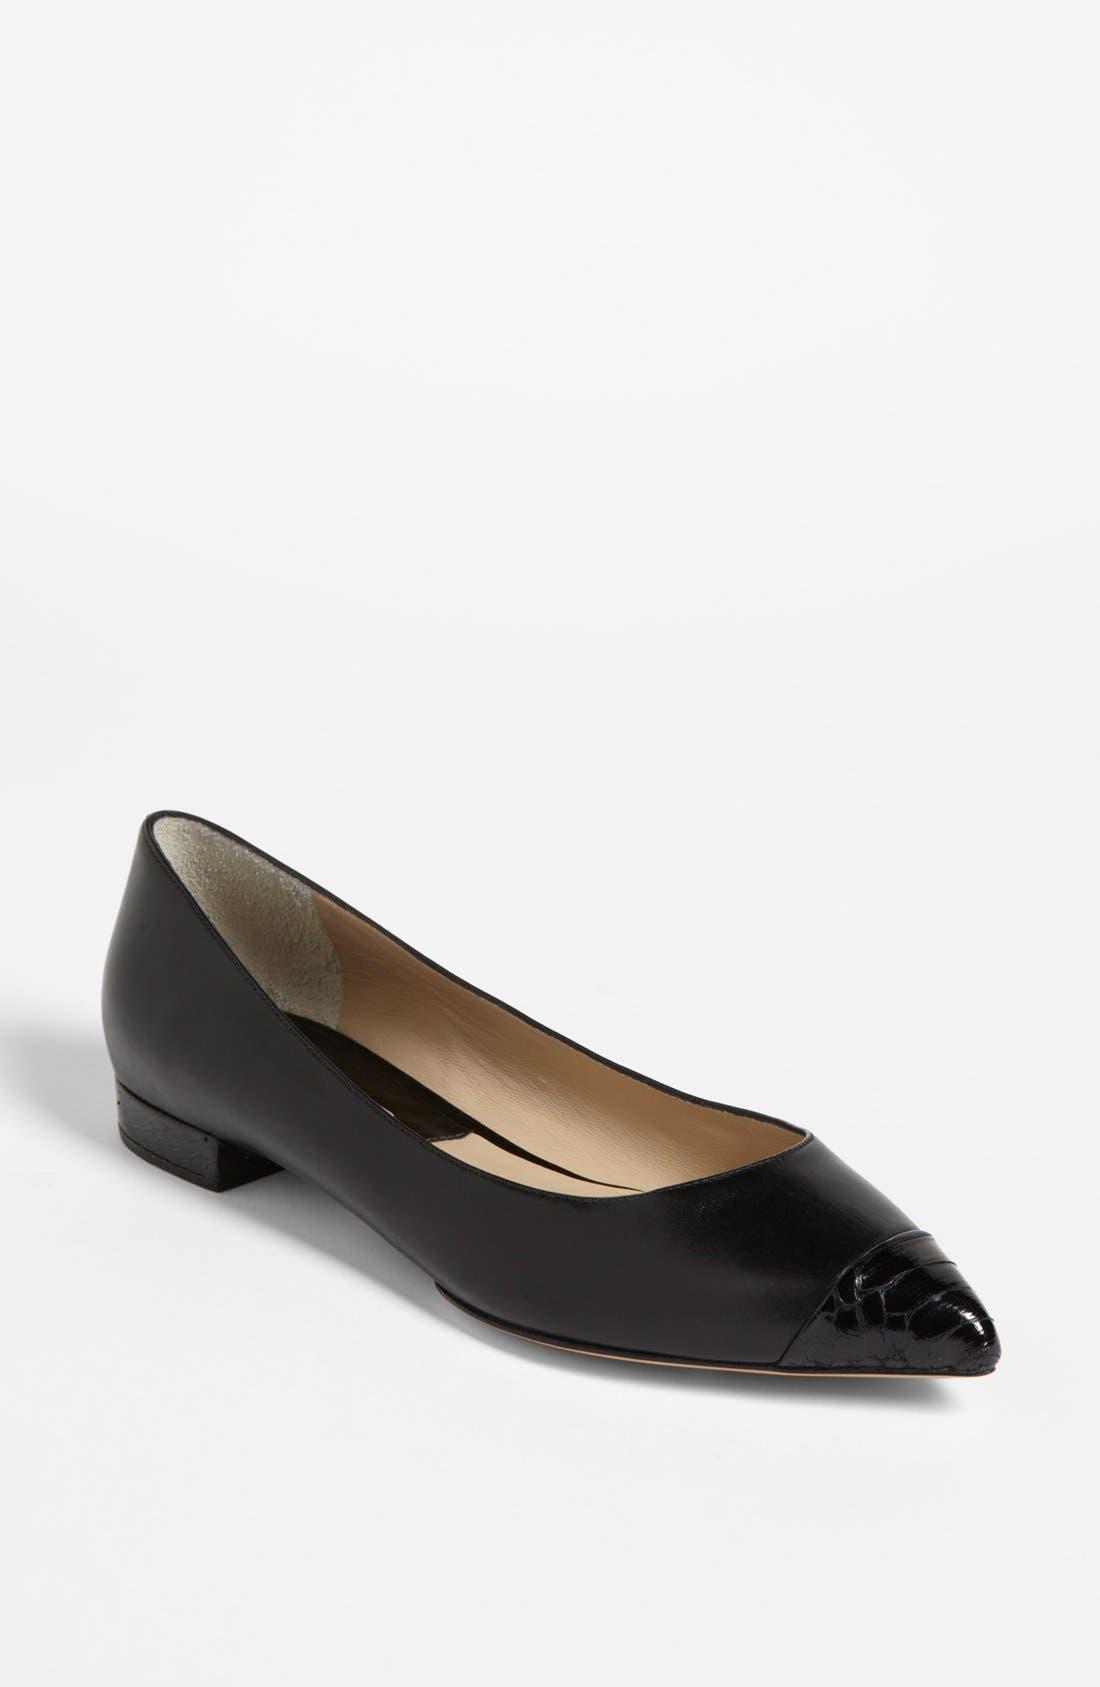 Main Image - Michael Kors 'Janae' Loafer Flat